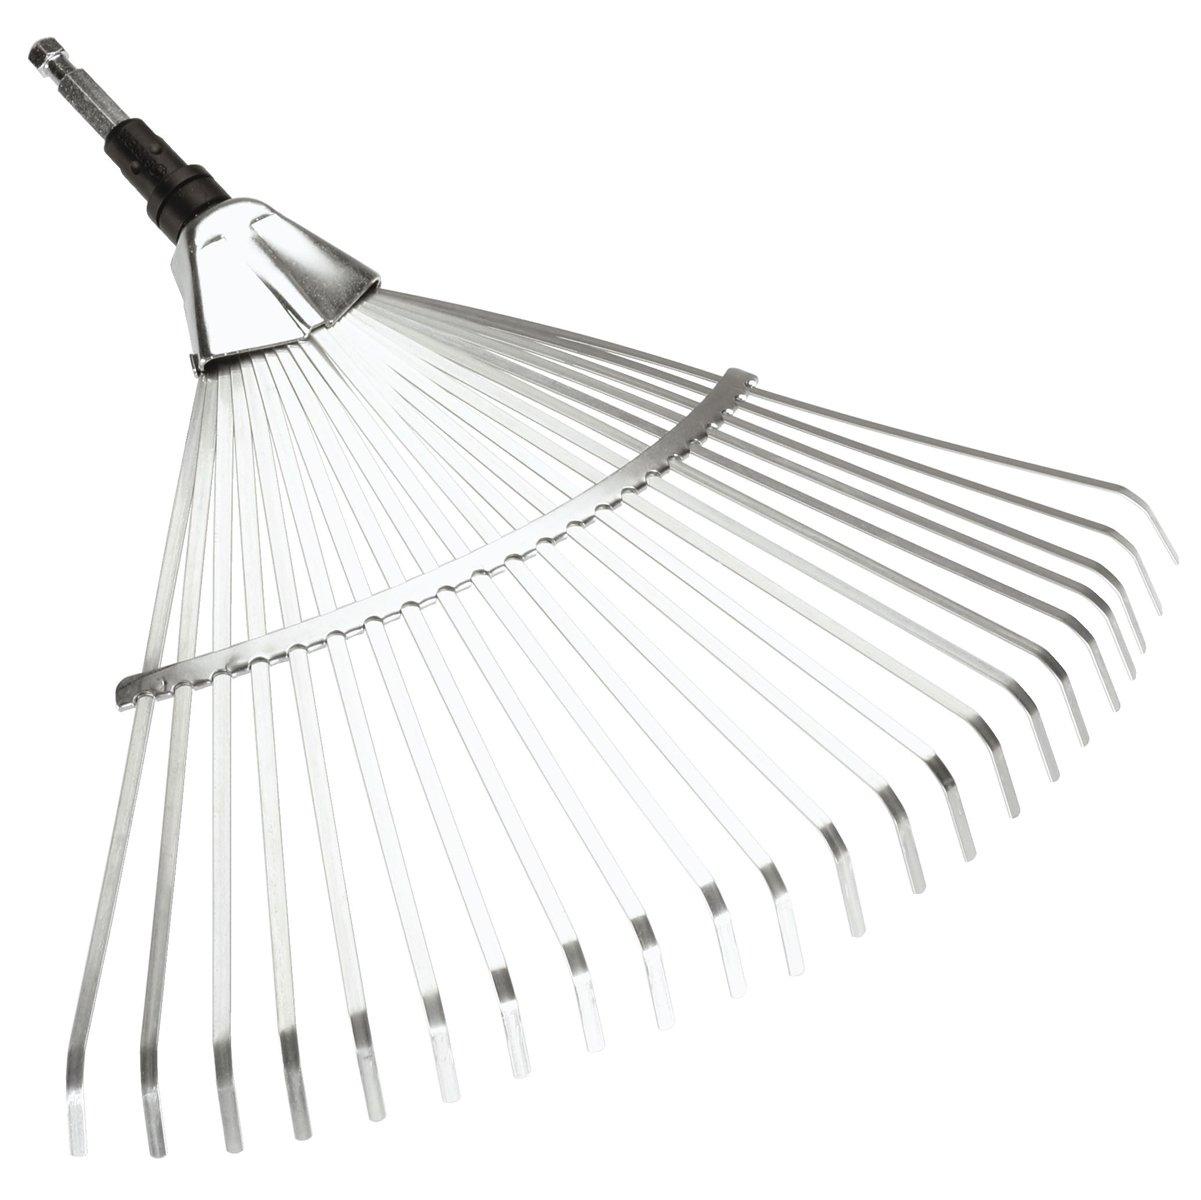 Gardena Combi System Fan Rake 3102-U